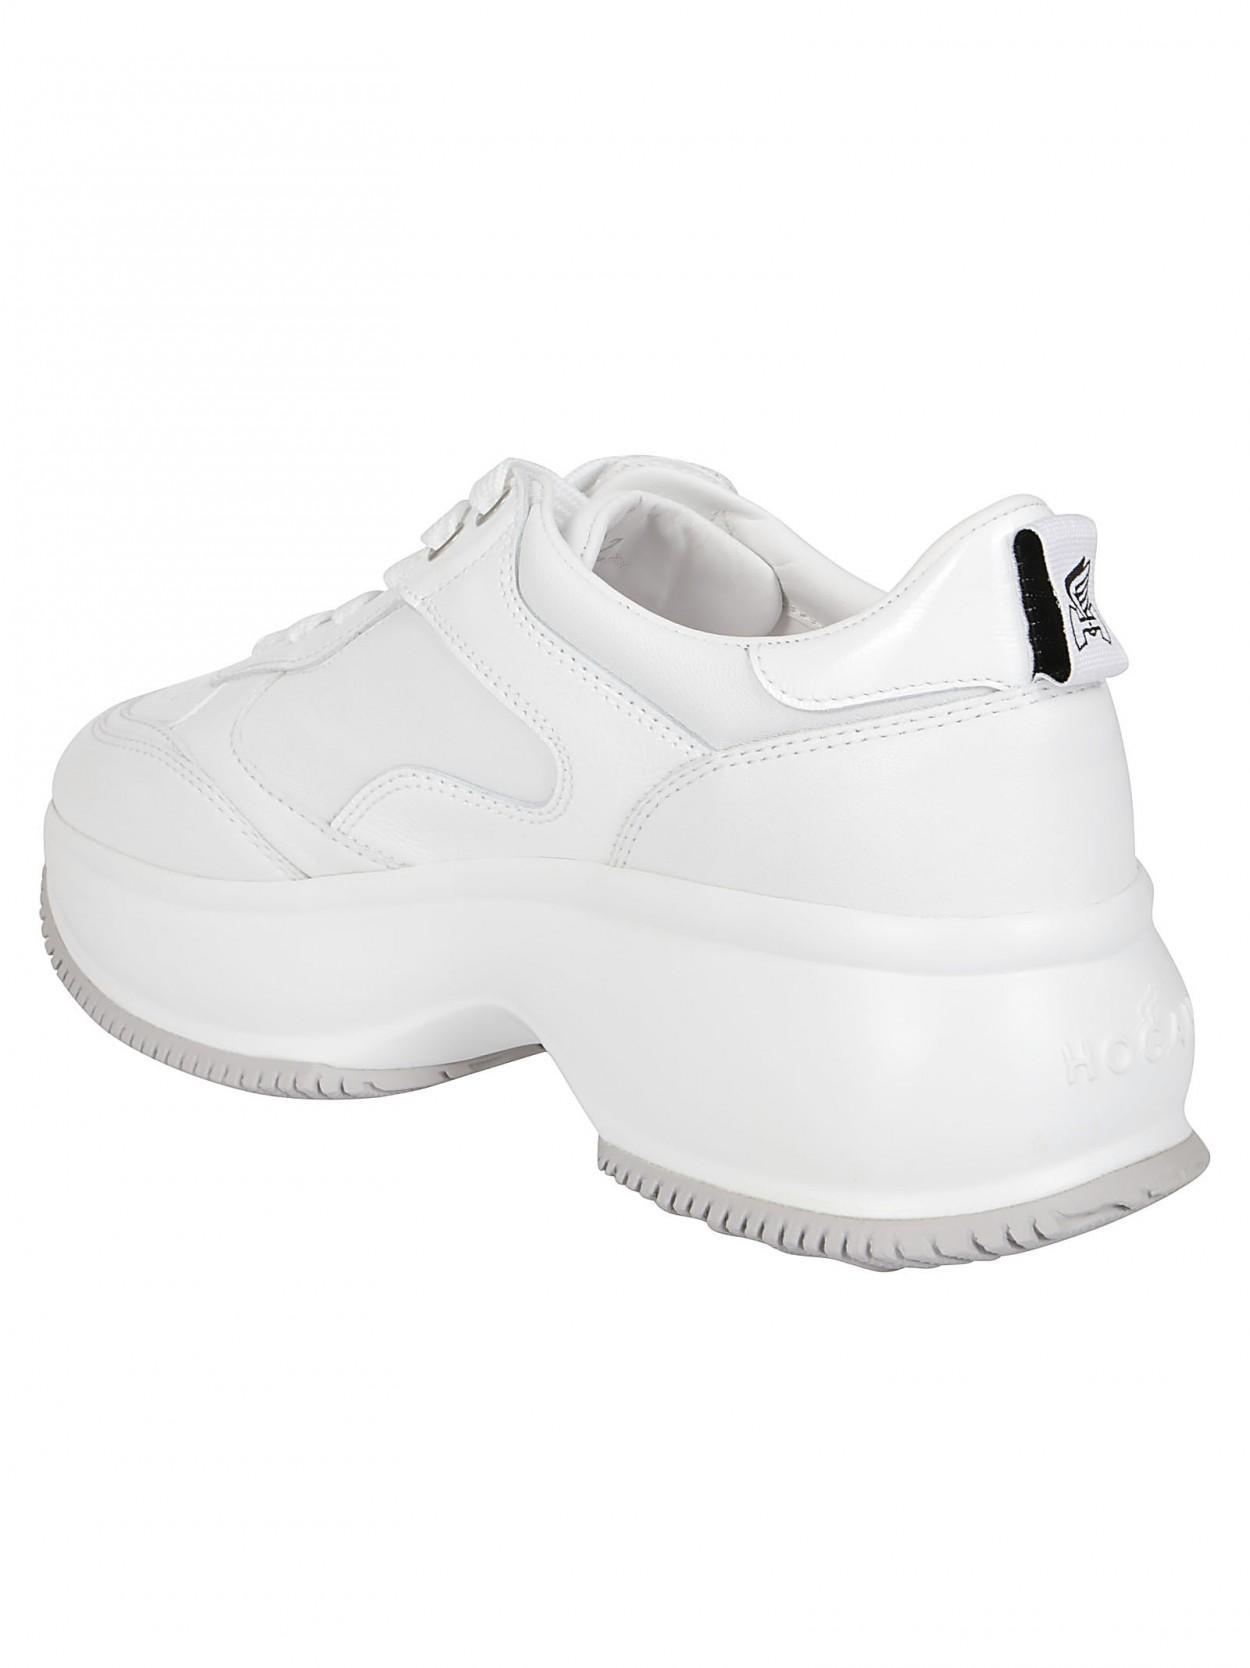 Hogan HOGAN Sneaker maxi active bianca in White Lyst